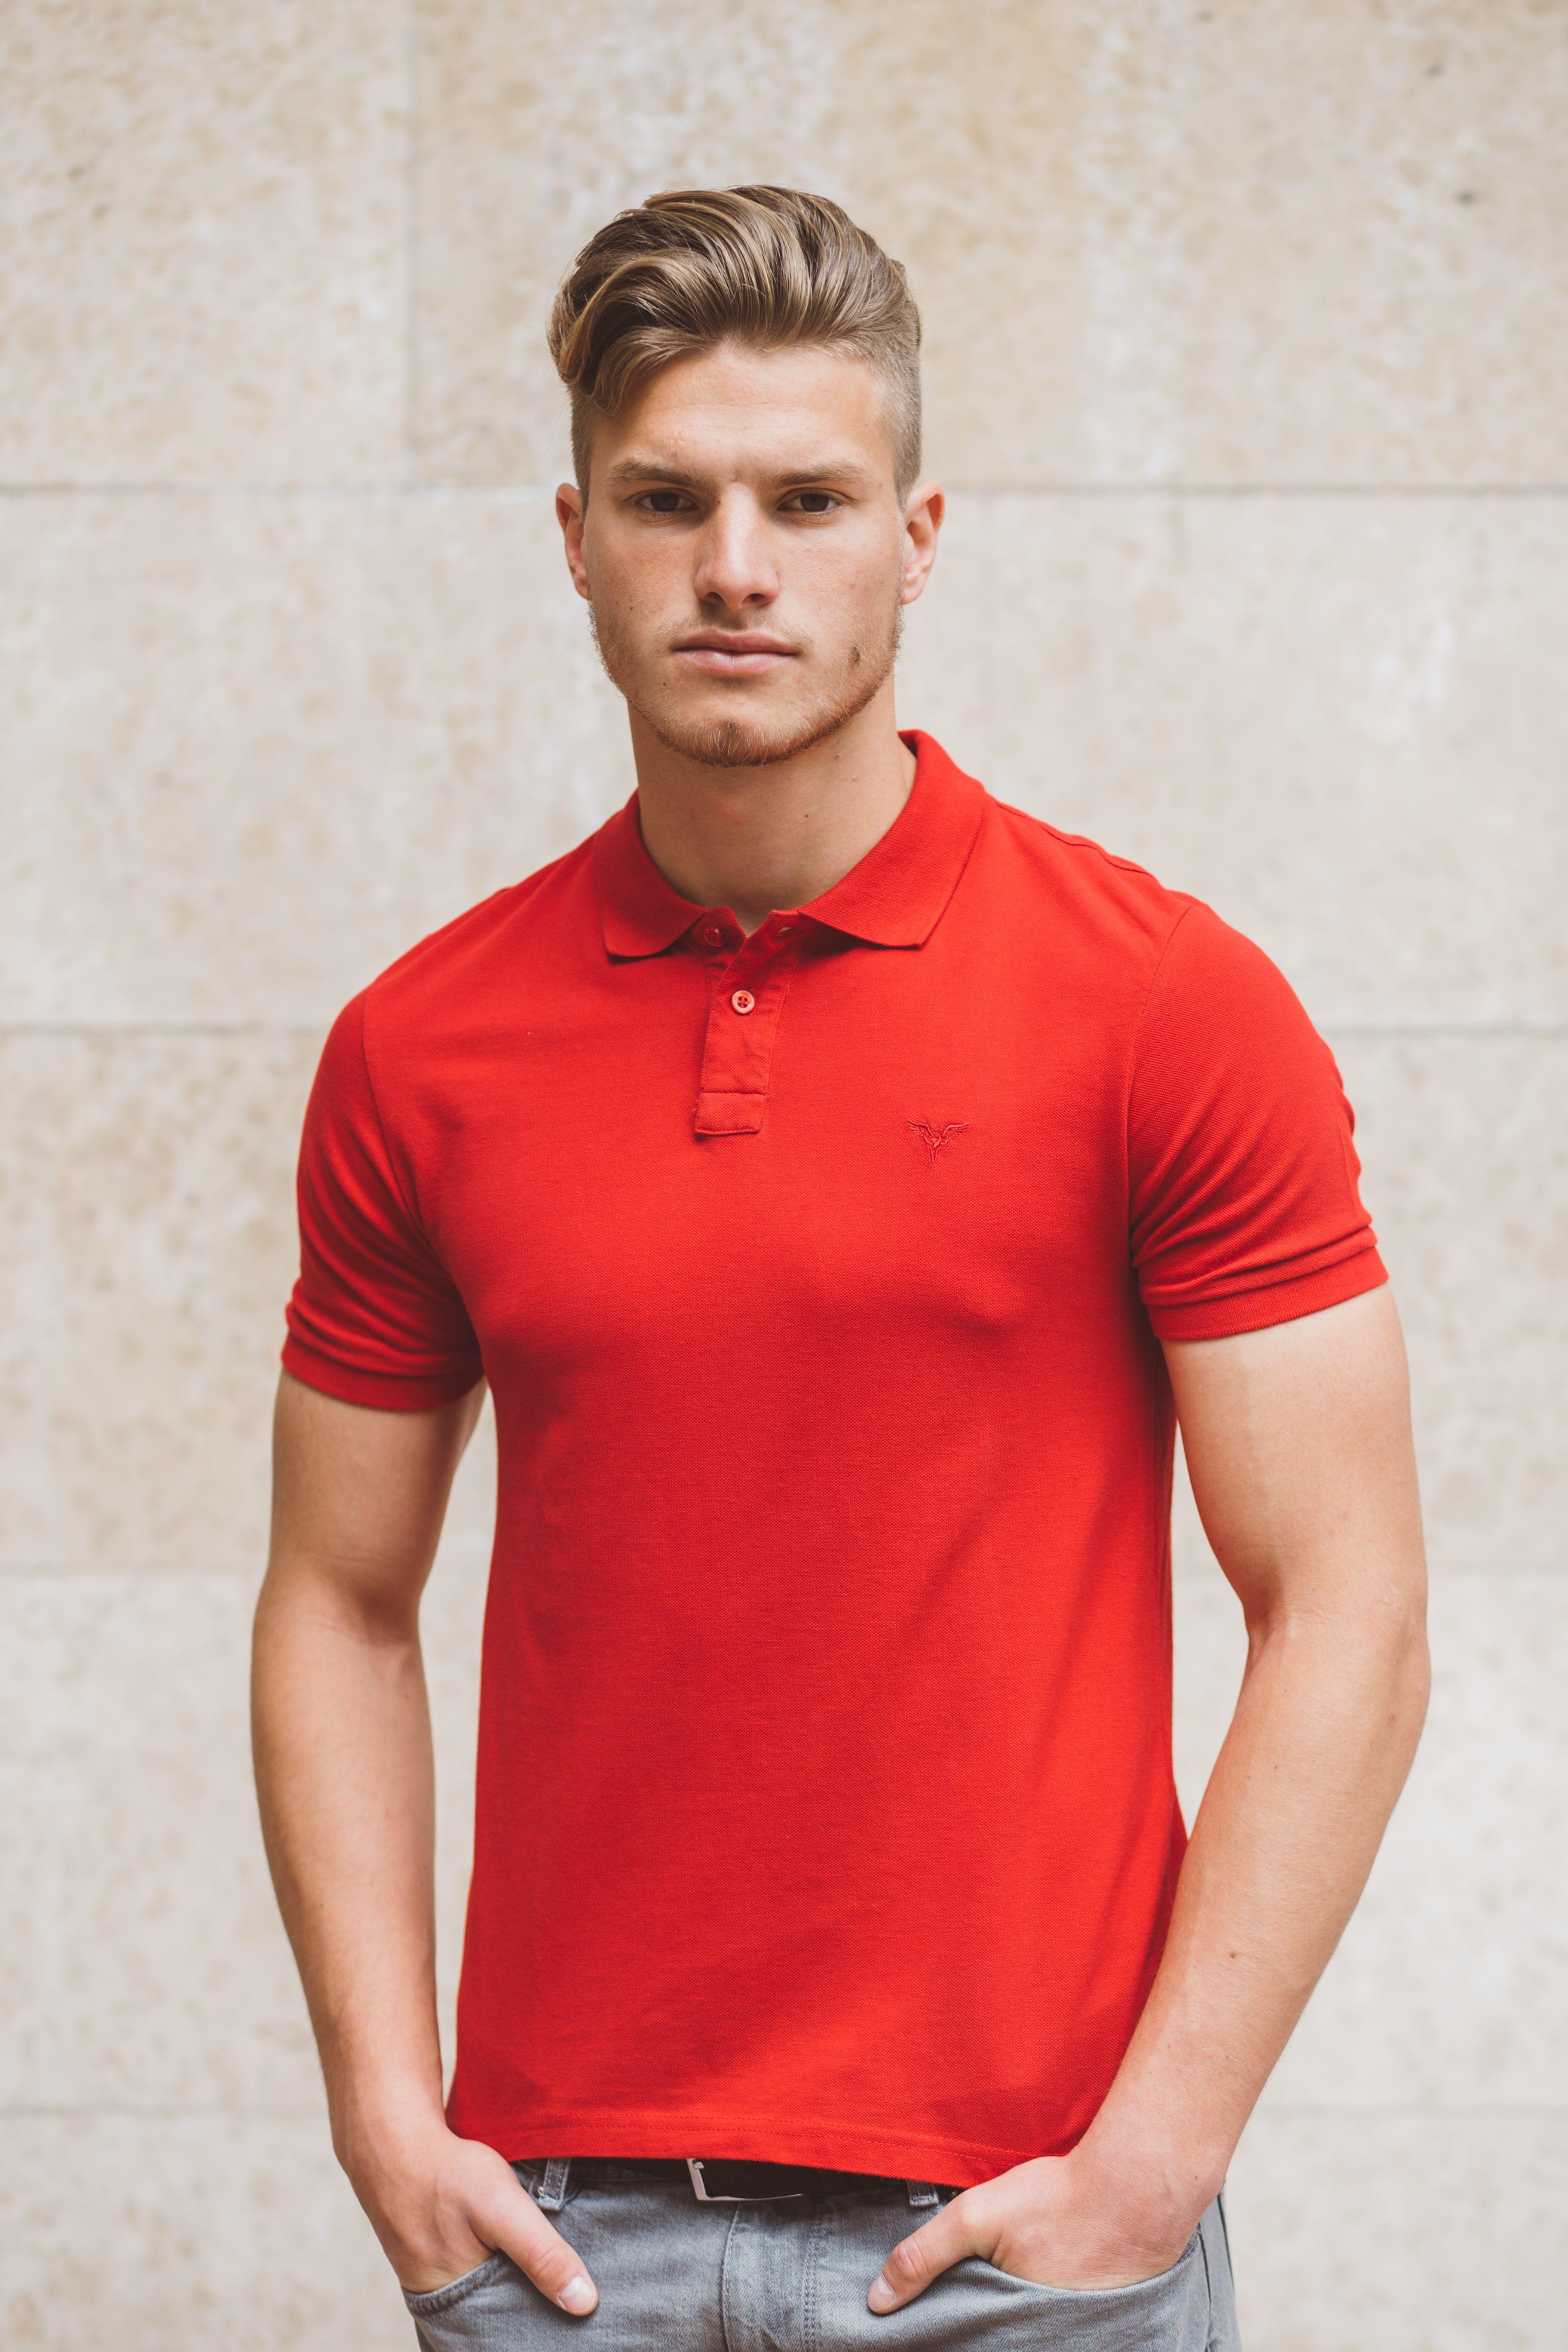 Tudors | Modern Fit SS16 #Tudors #Modernfit #Shirt #style #menstyle #menswear #fashion #casual #outfit #Gomlek #Tudorsshirt